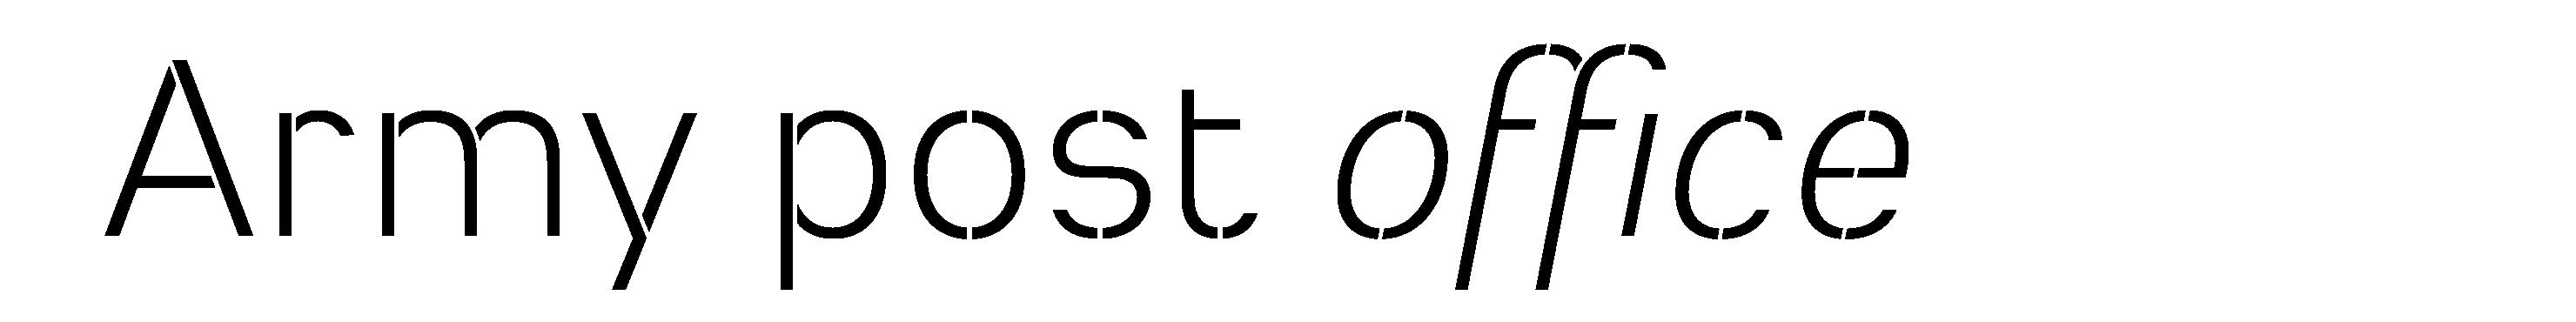 Typeface Heimat Stencil D08 Atlas Font Foundry